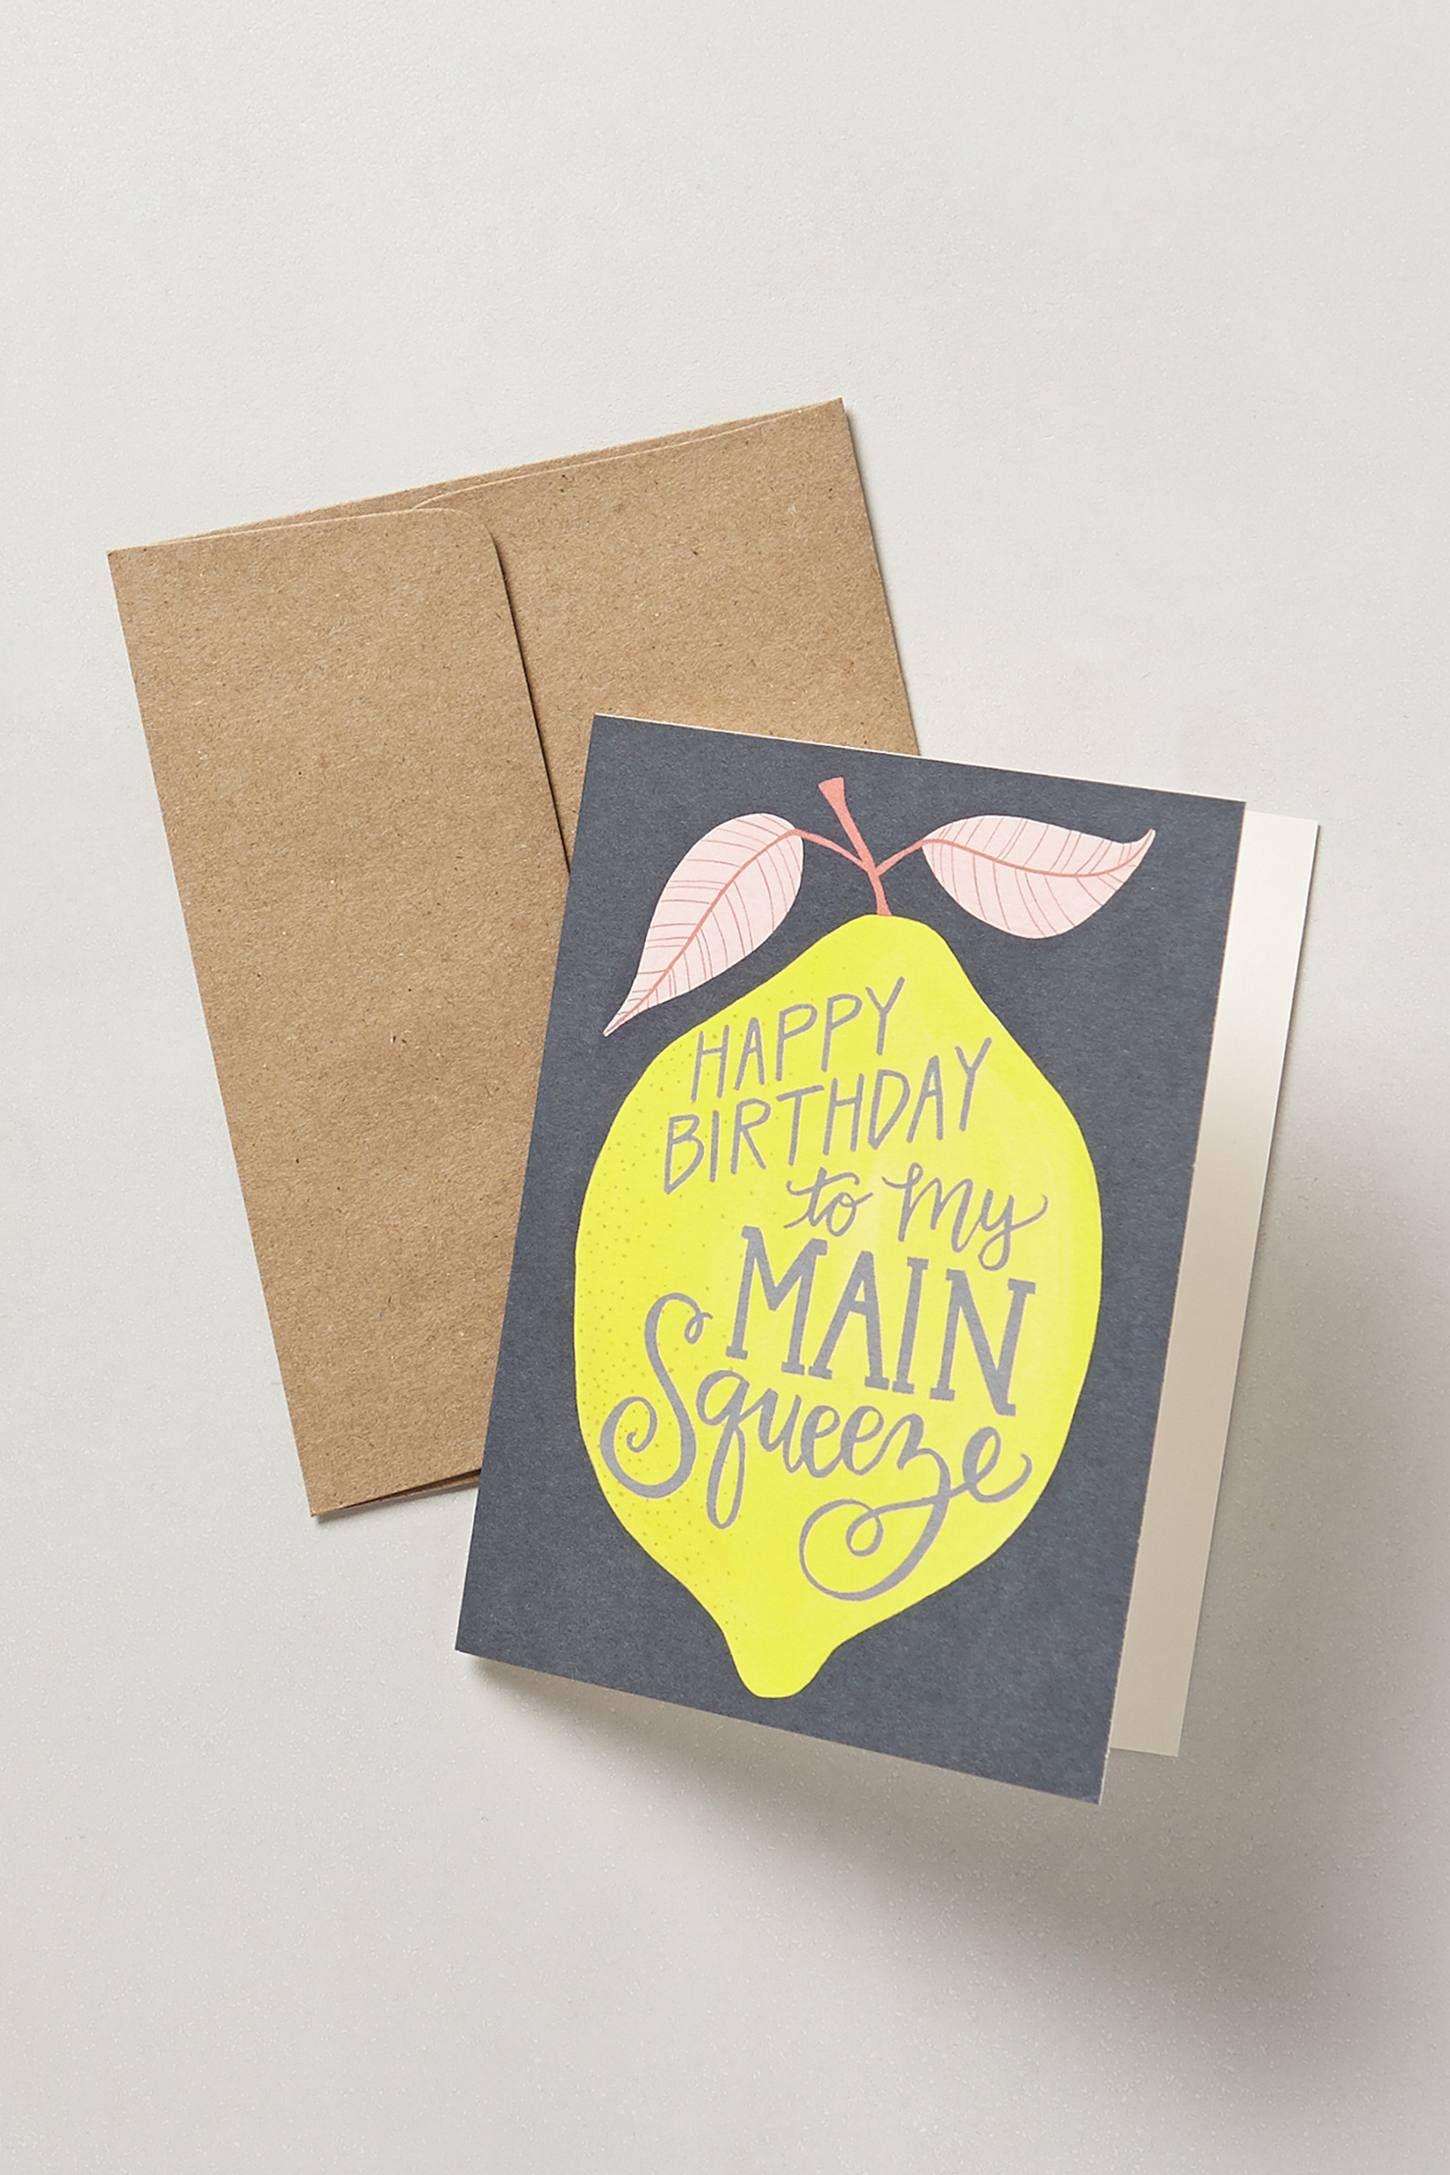 Main Squeeze Birthday Card Dad Birthday Card Creative Birthday Cards Homemade Birthday Cards